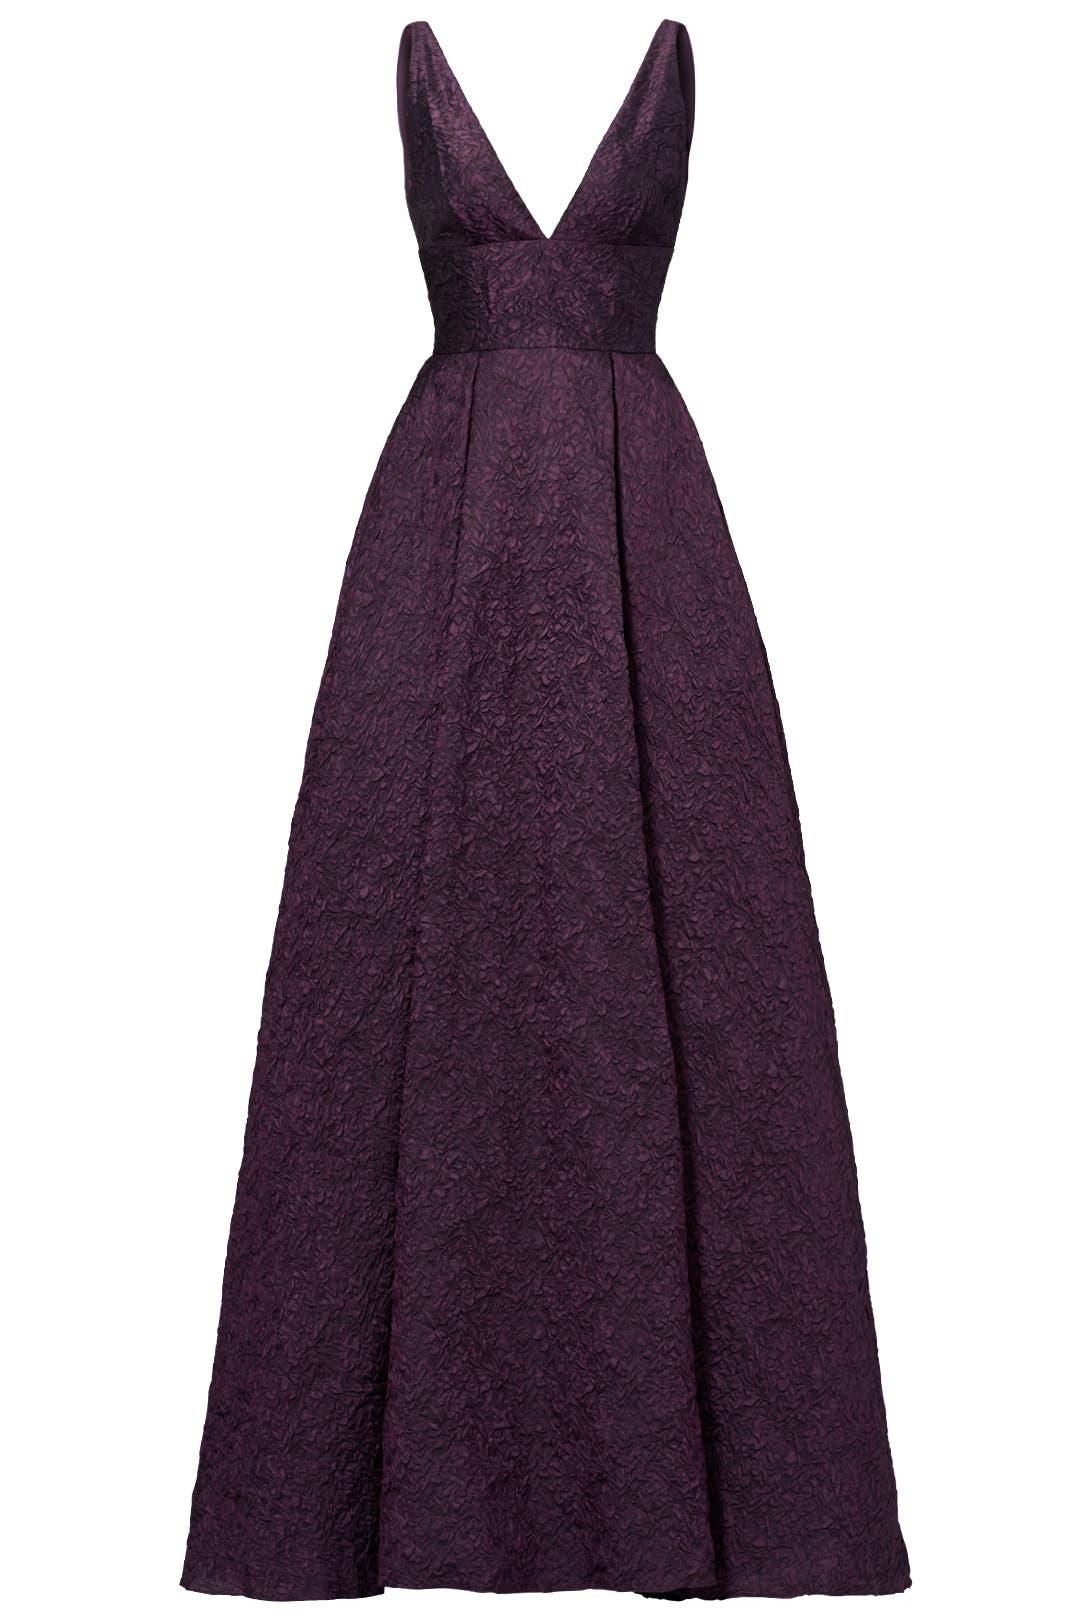 Rental Sleeve Prom Long Dress